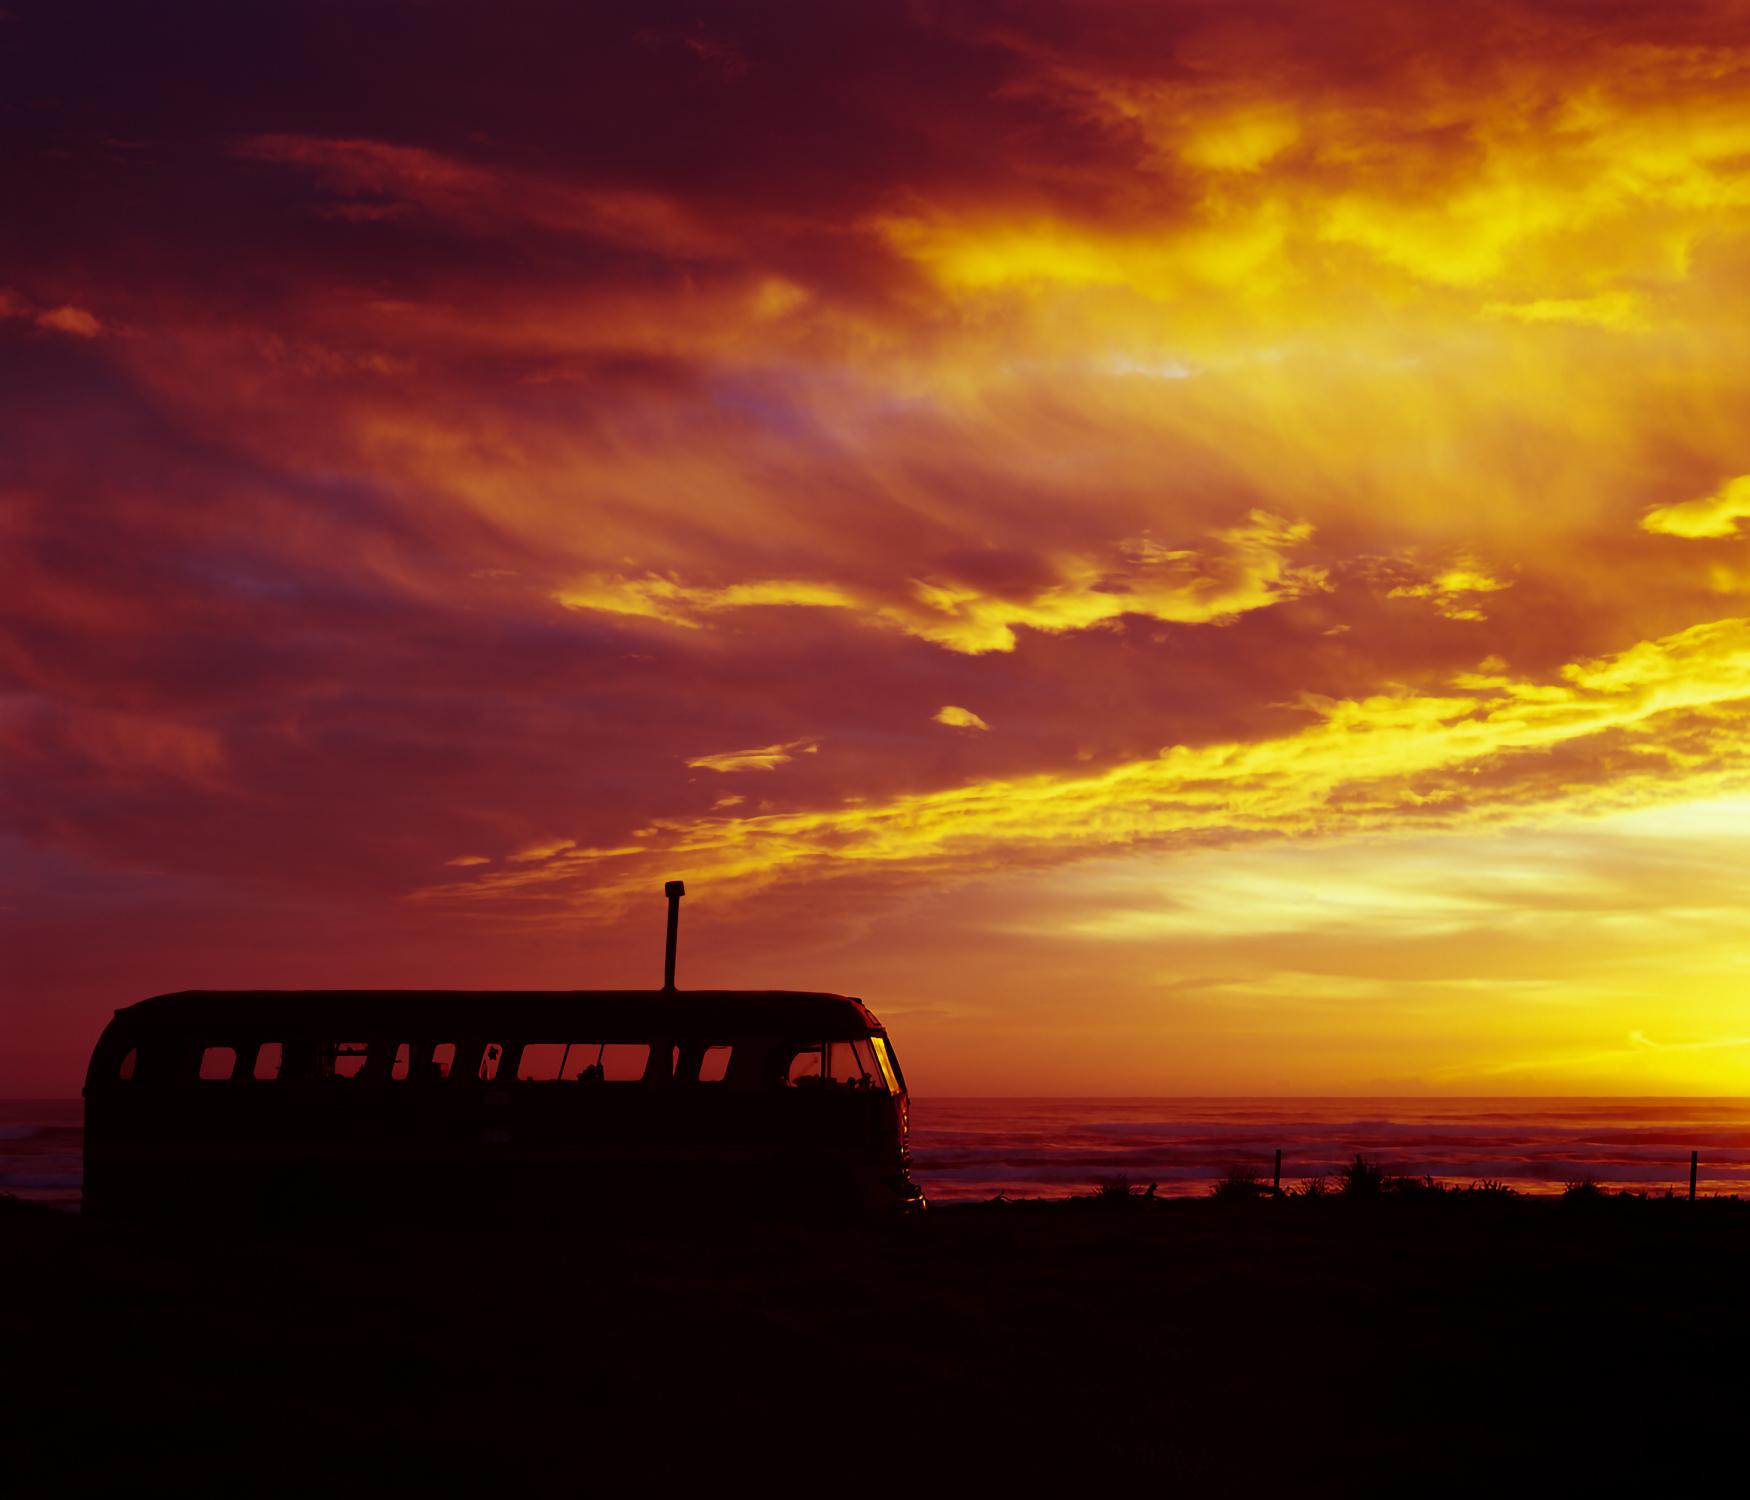 House bus